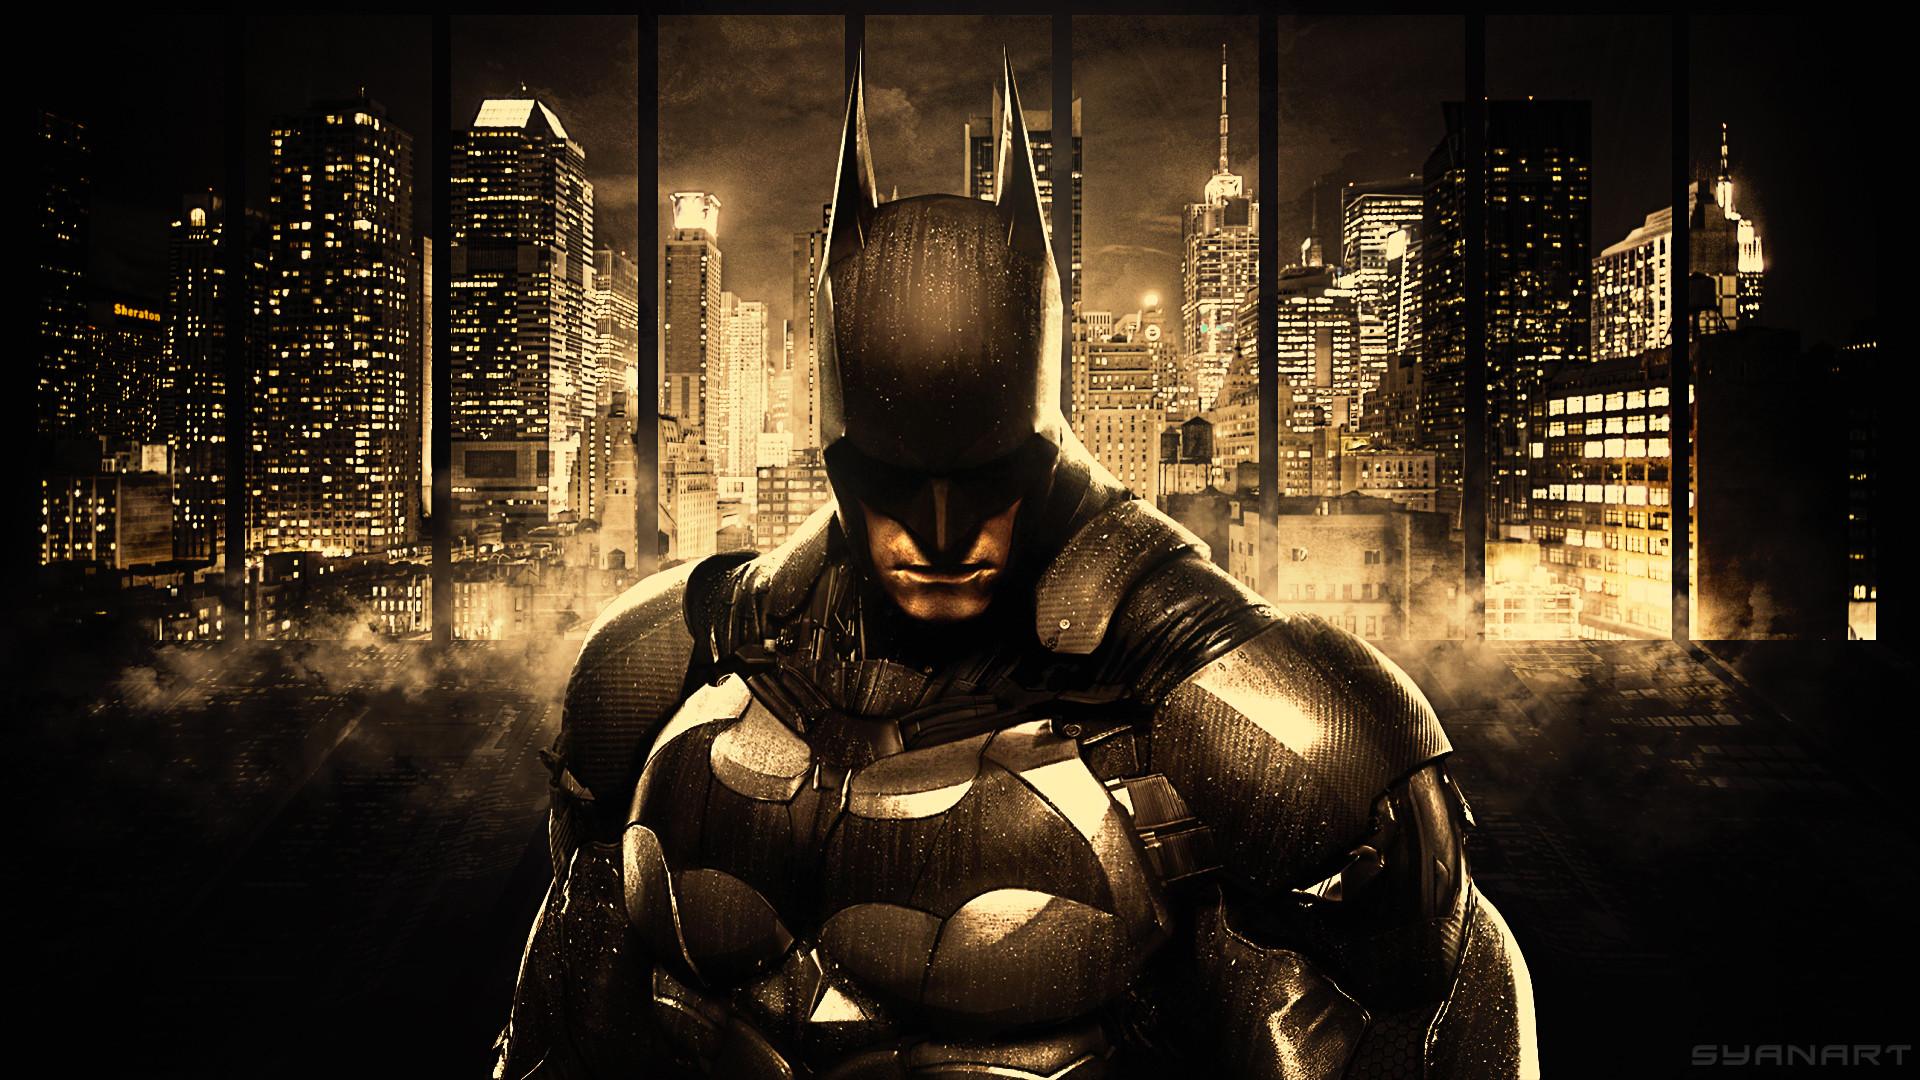 Batman Arkham Knight 4K Wallpaper (67+ images)